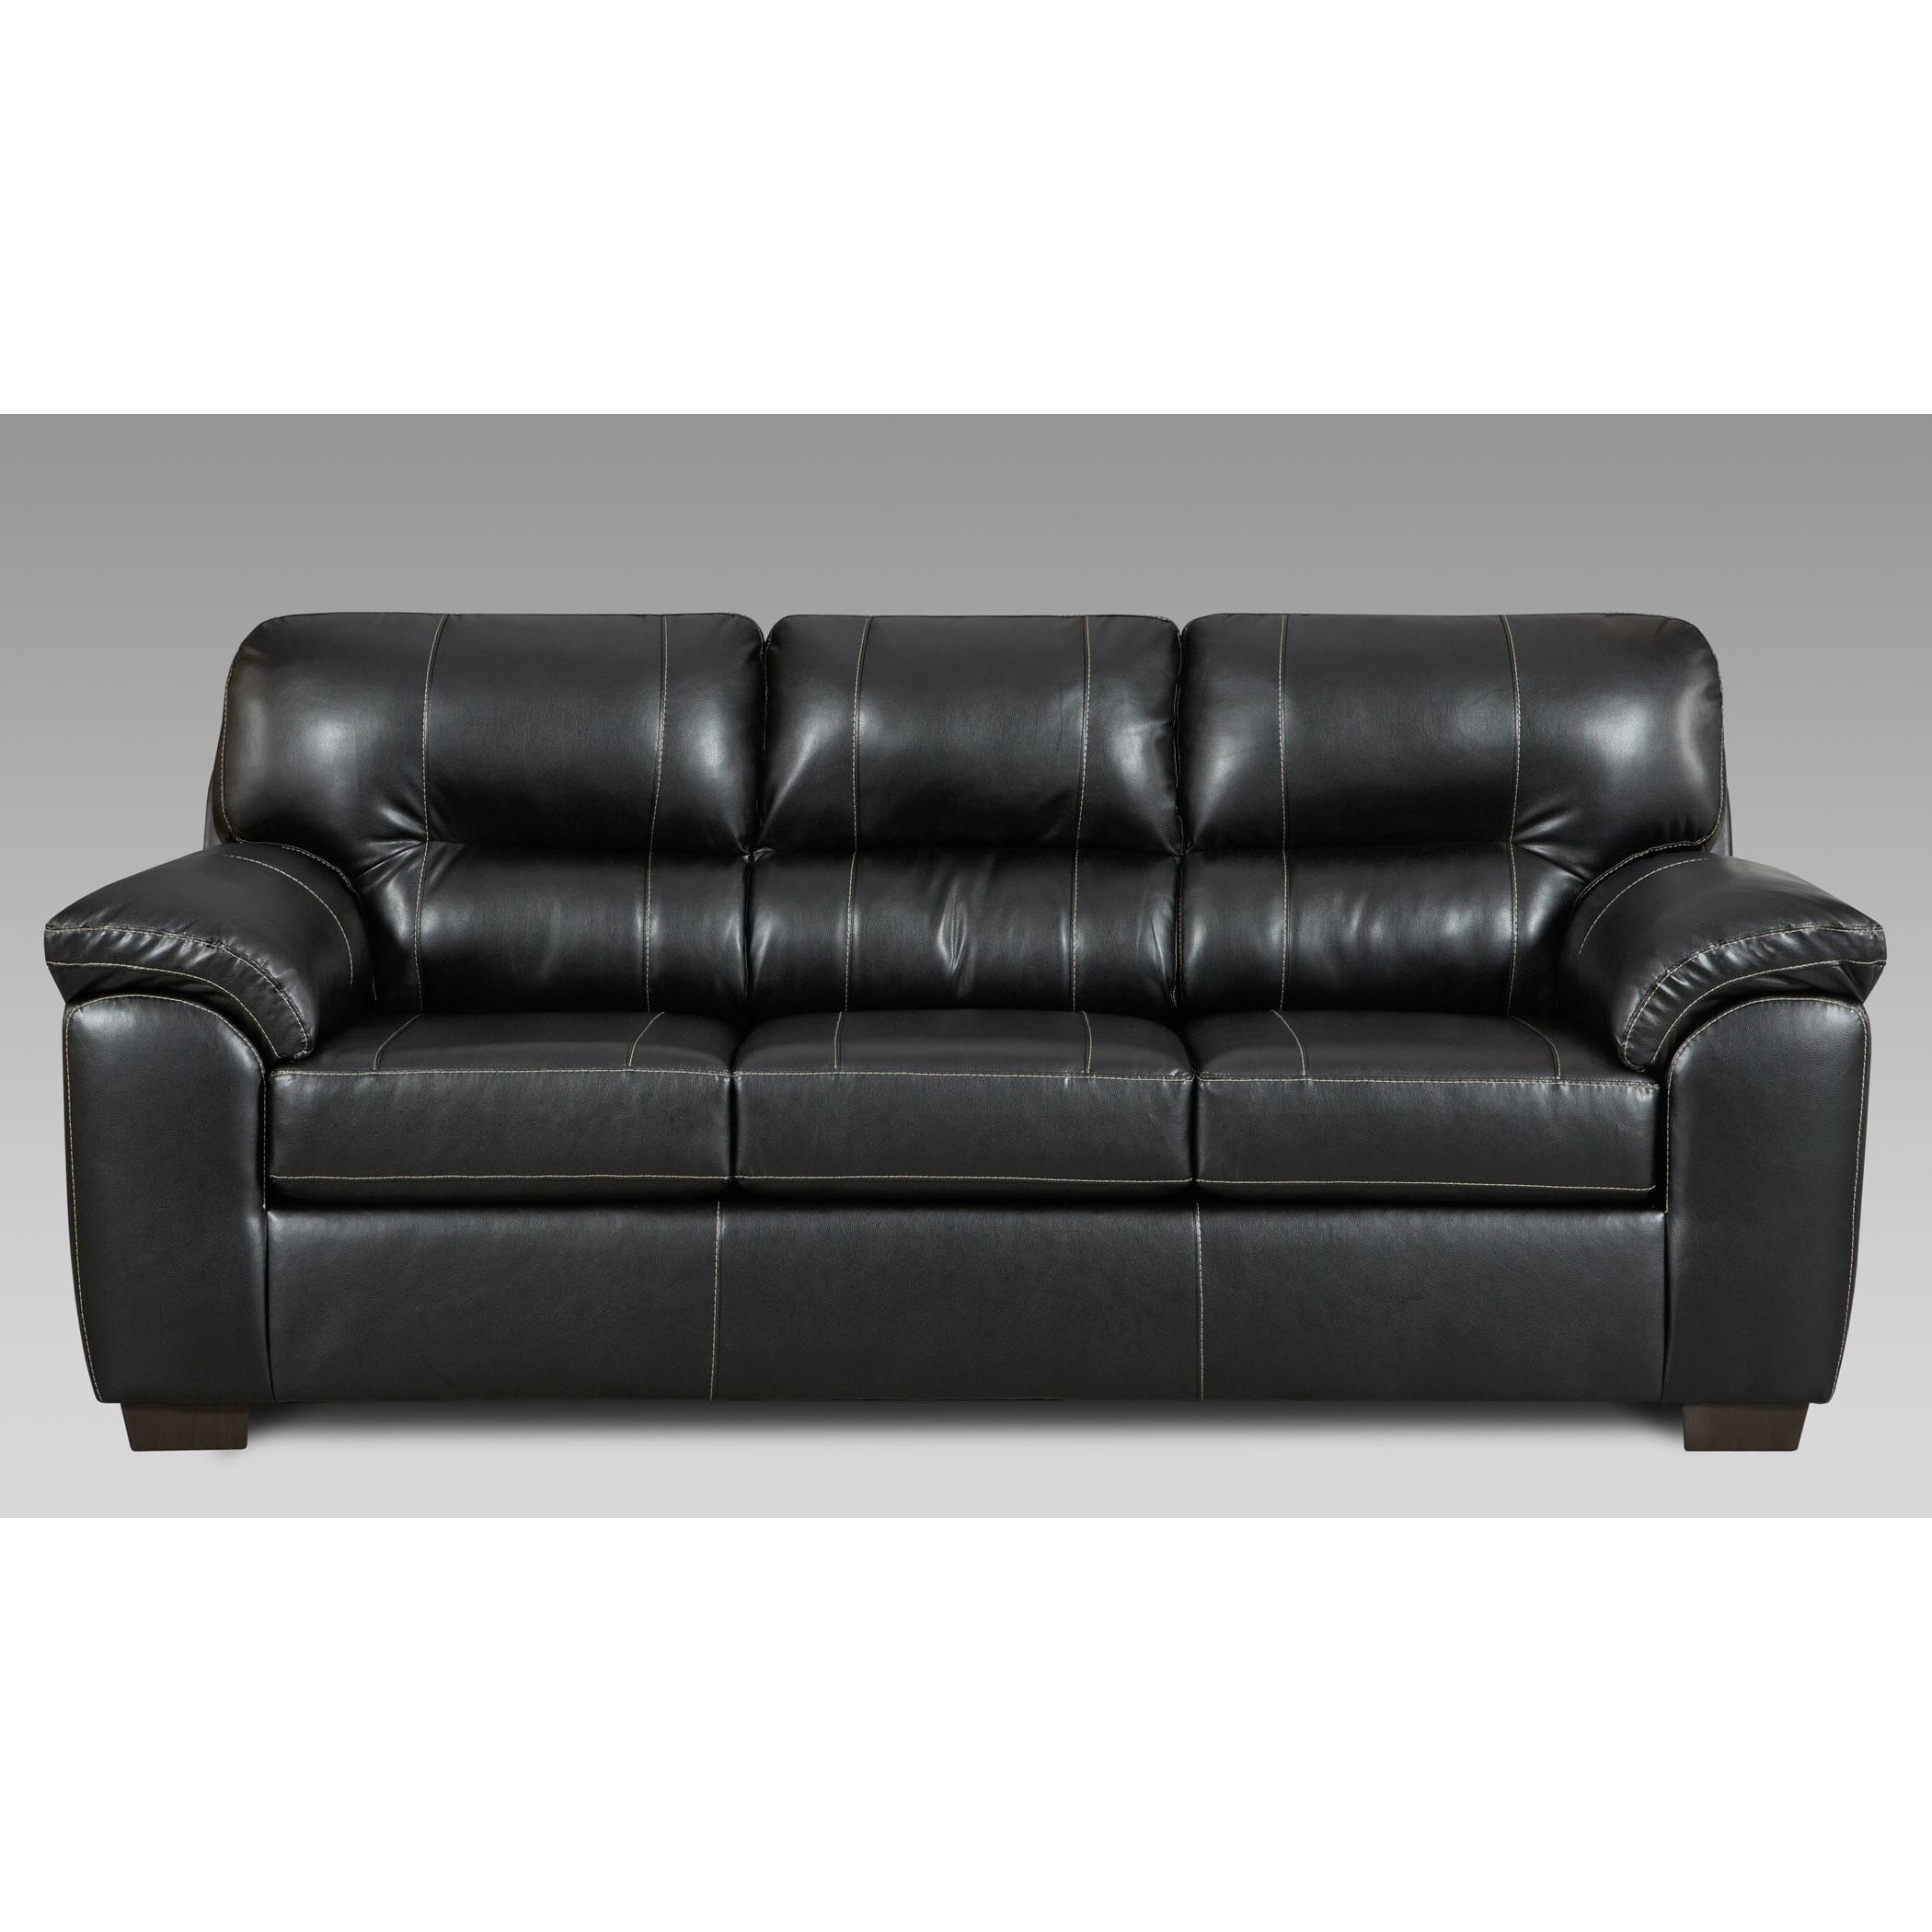 Leeds Austin Black Faux Leather Sofa